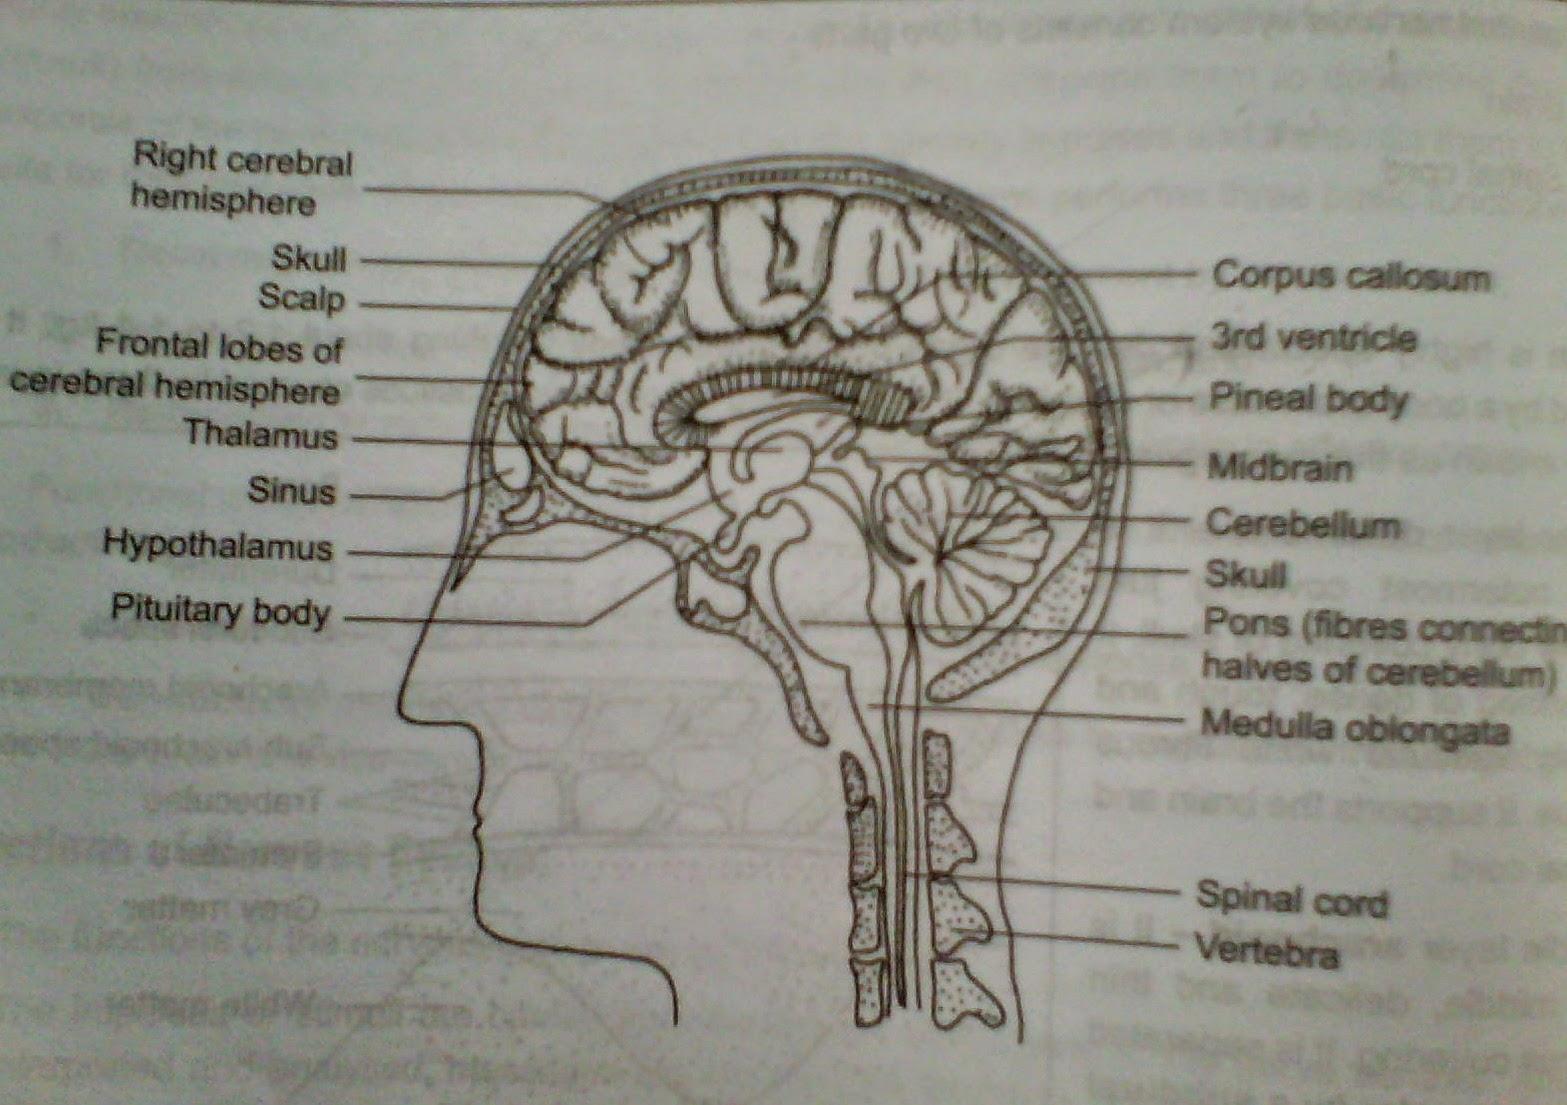 Zoology For Hseb Nervous System Or Nervous Co Ordination